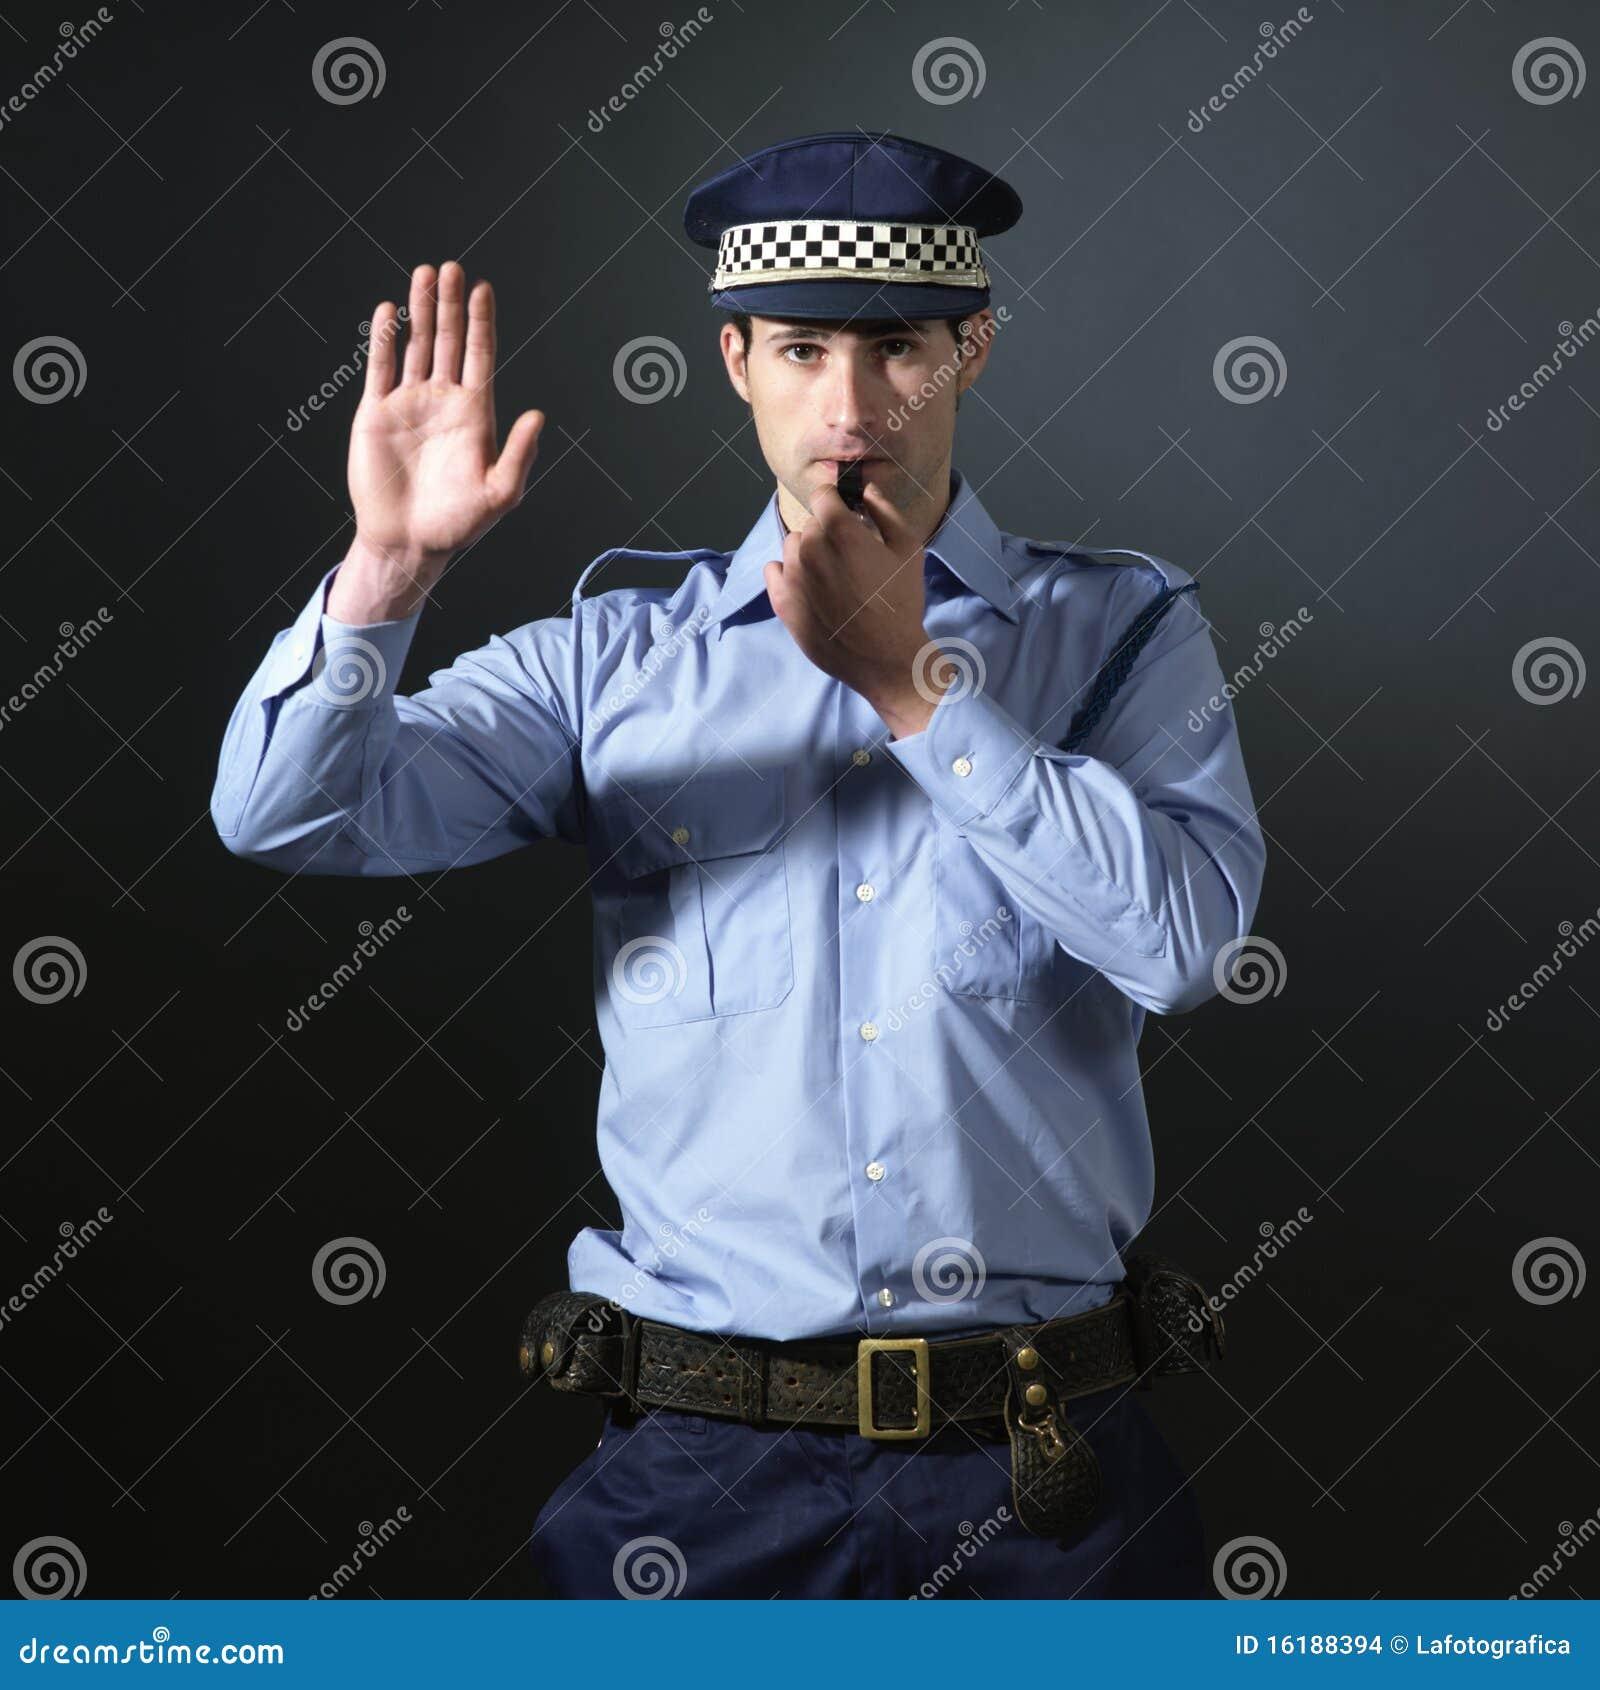 Policeman gesturing to stop.